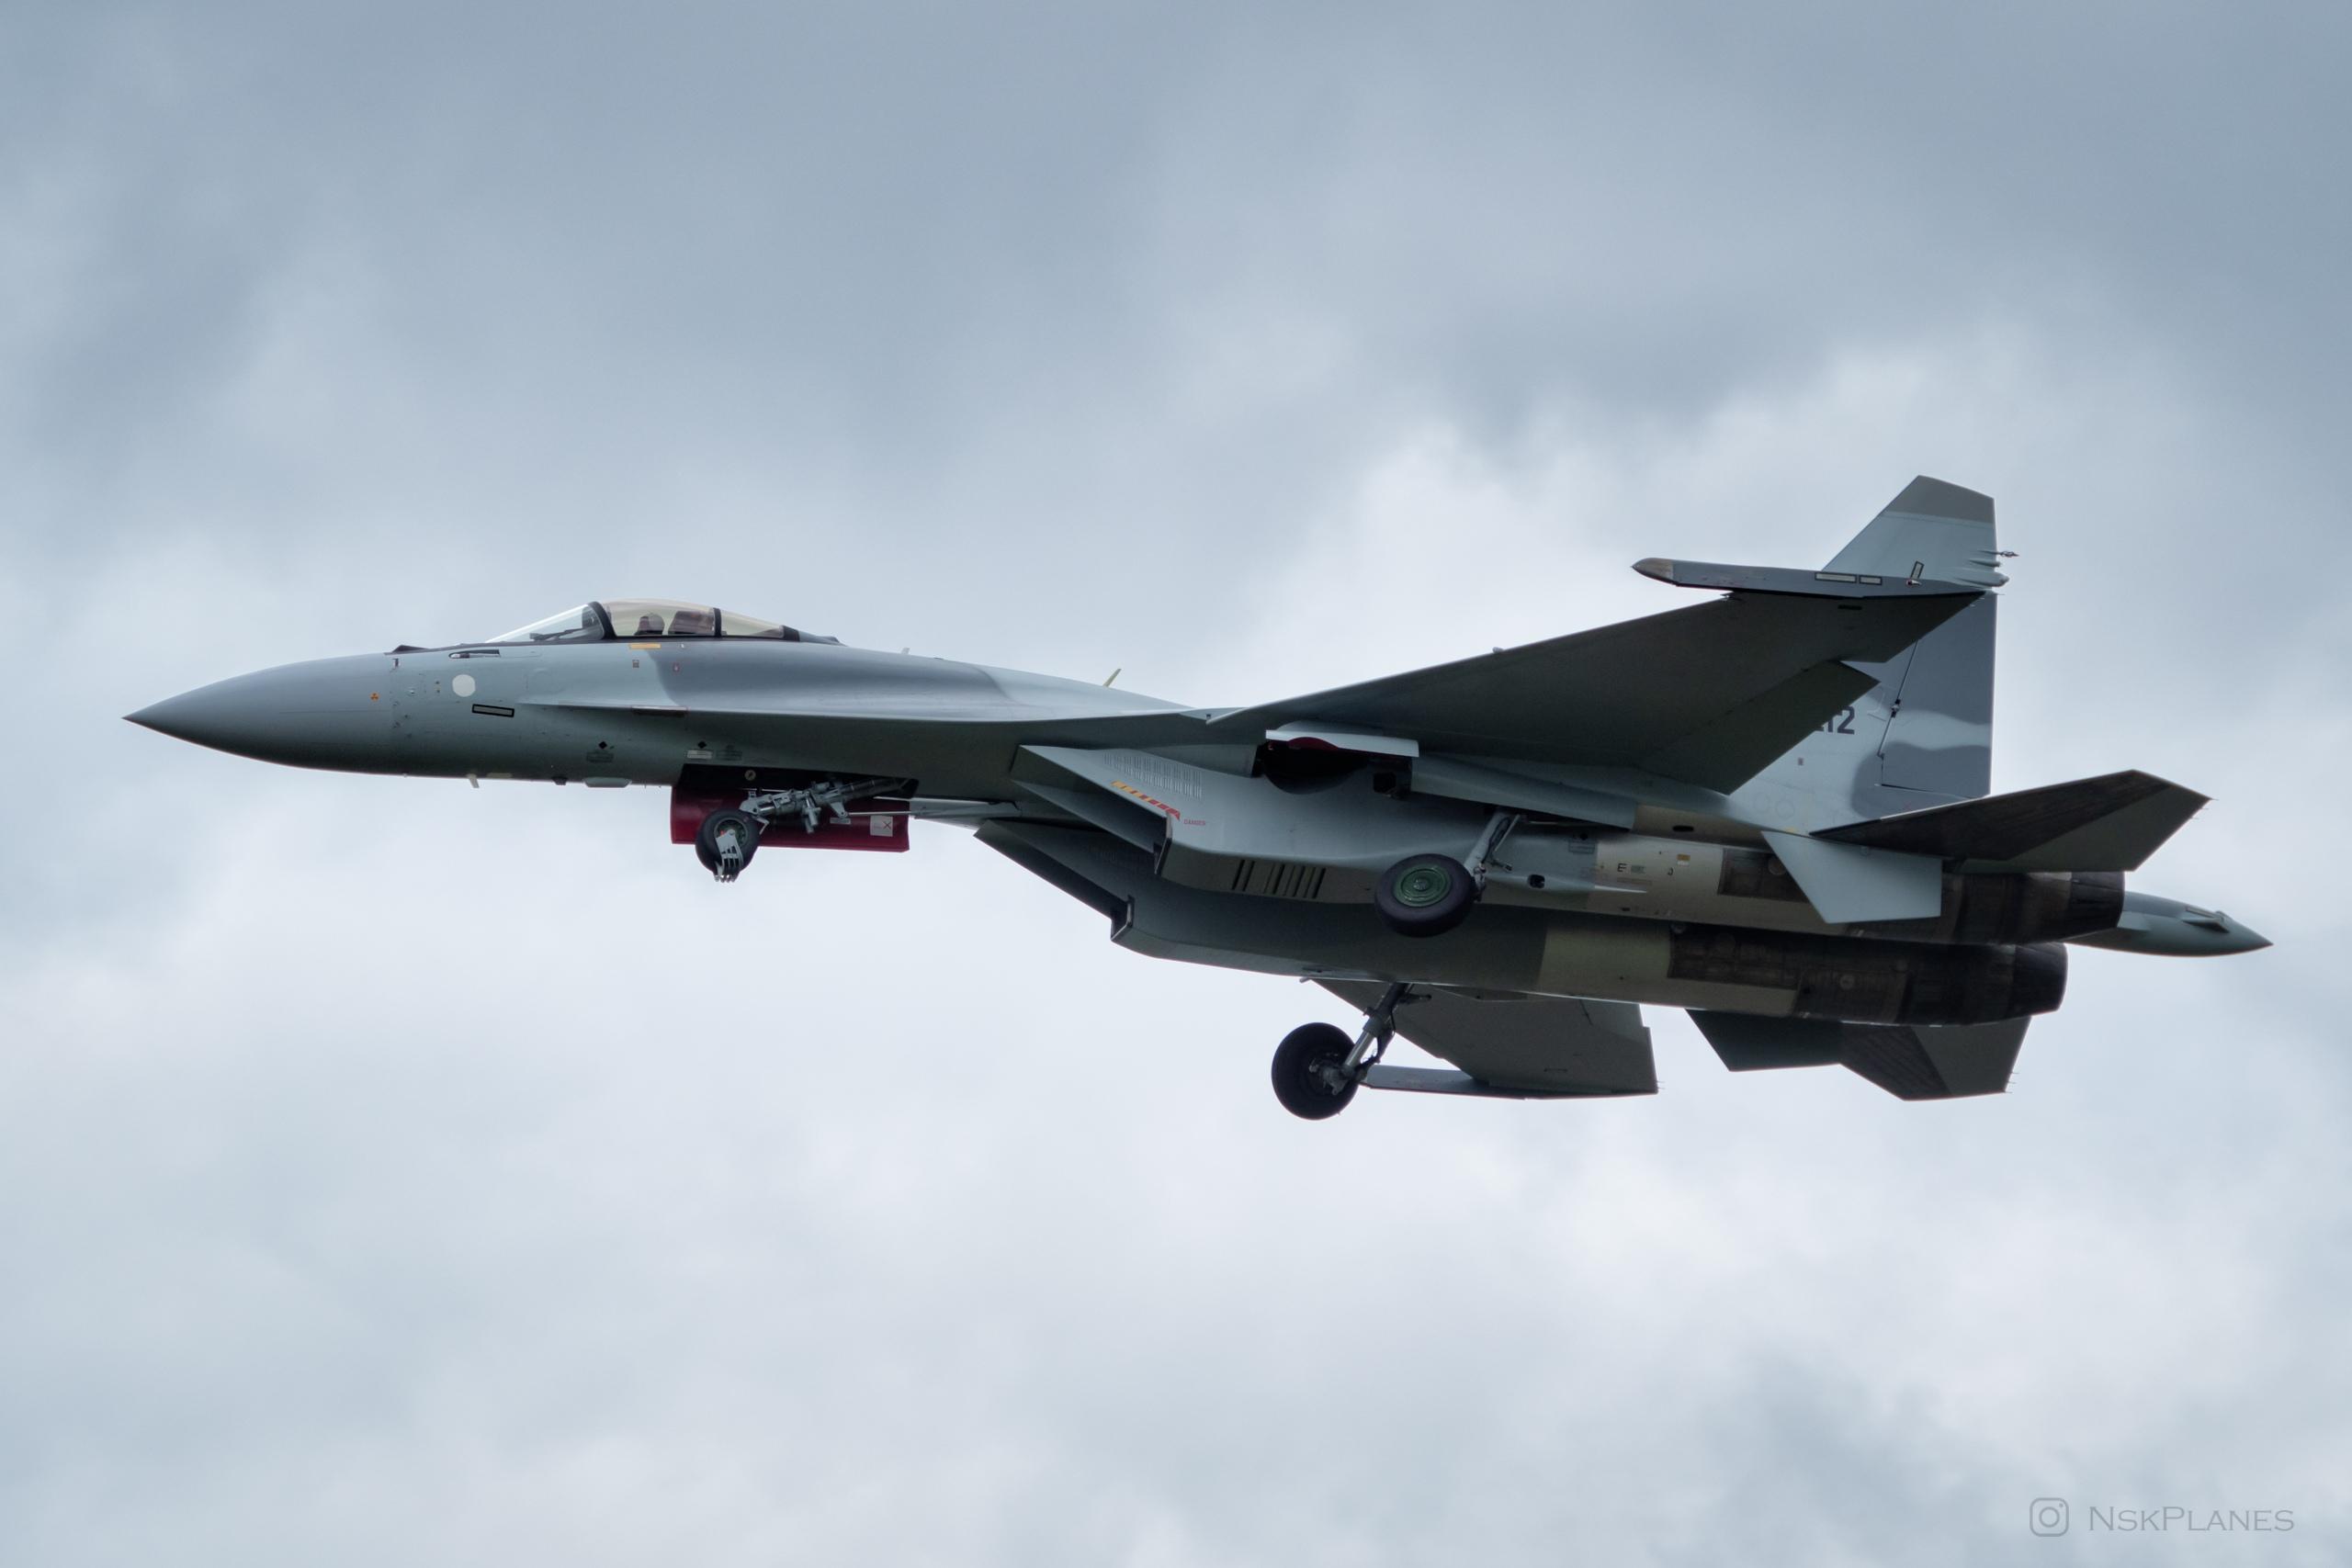 http://forums.airforce.ru/attachments/sovremennost/100199d1595419760-mmxhsr4z2wq.jpg/